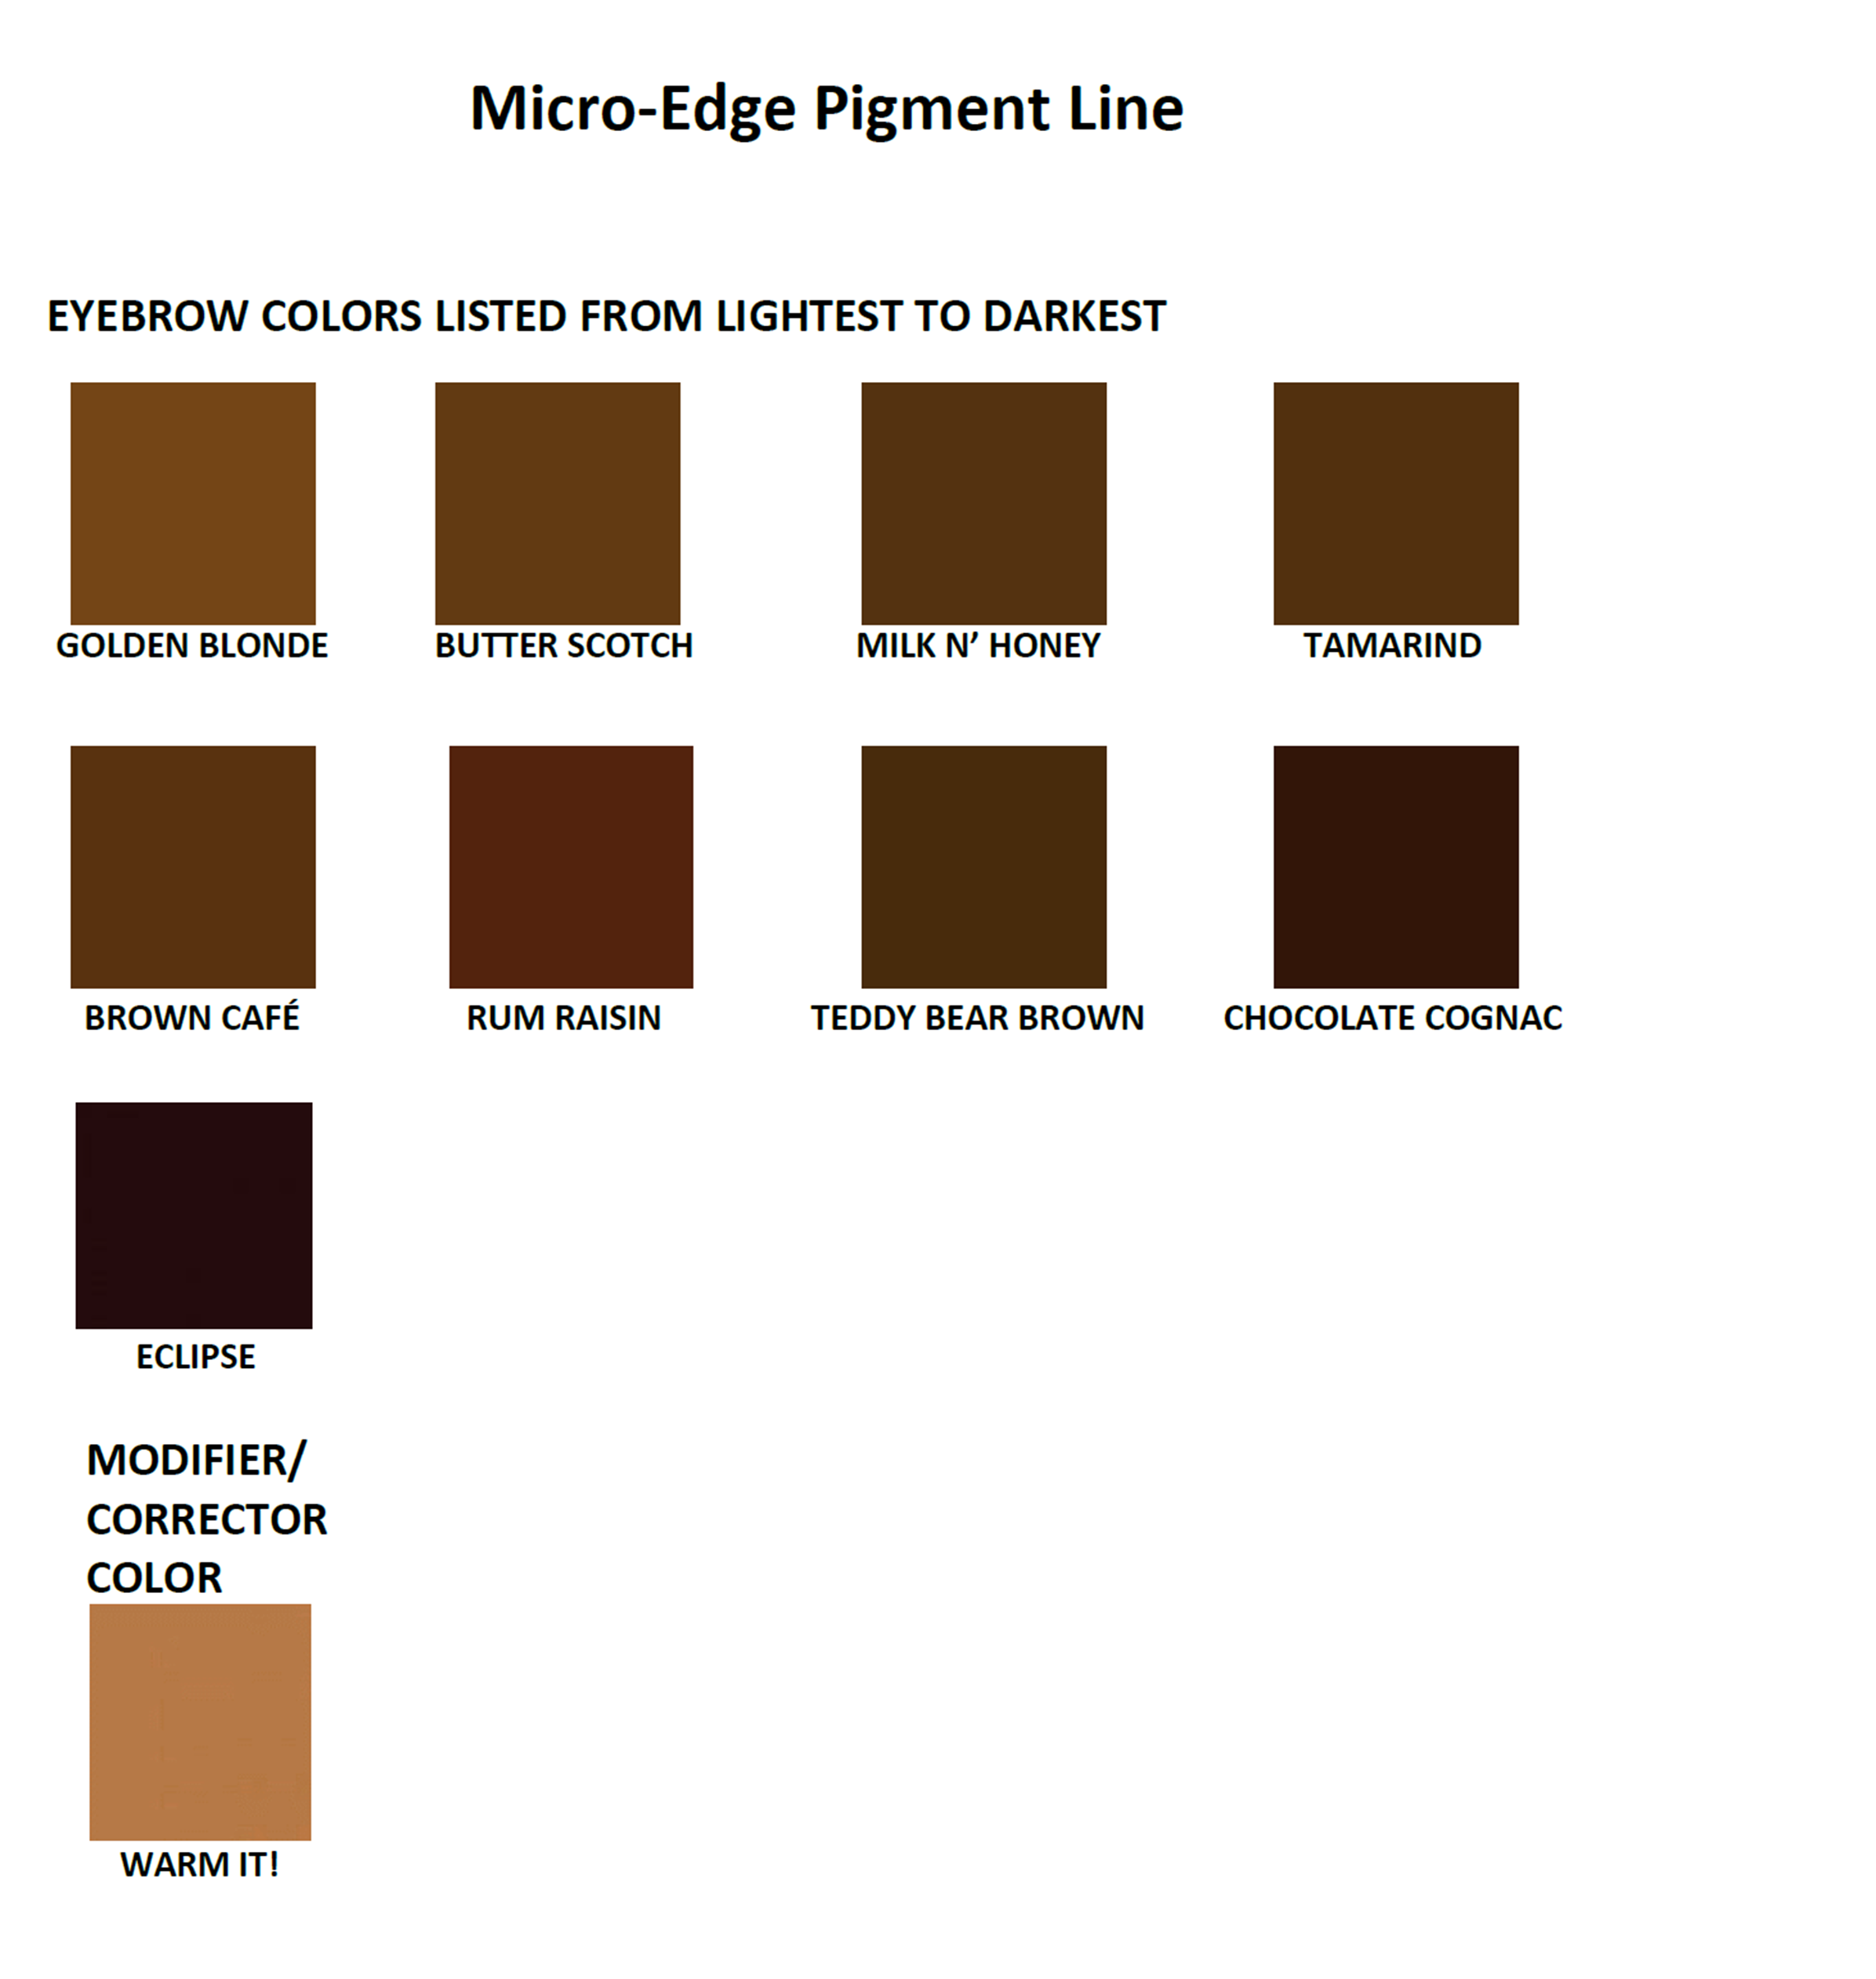 li_pigment_micro_edge.PNG